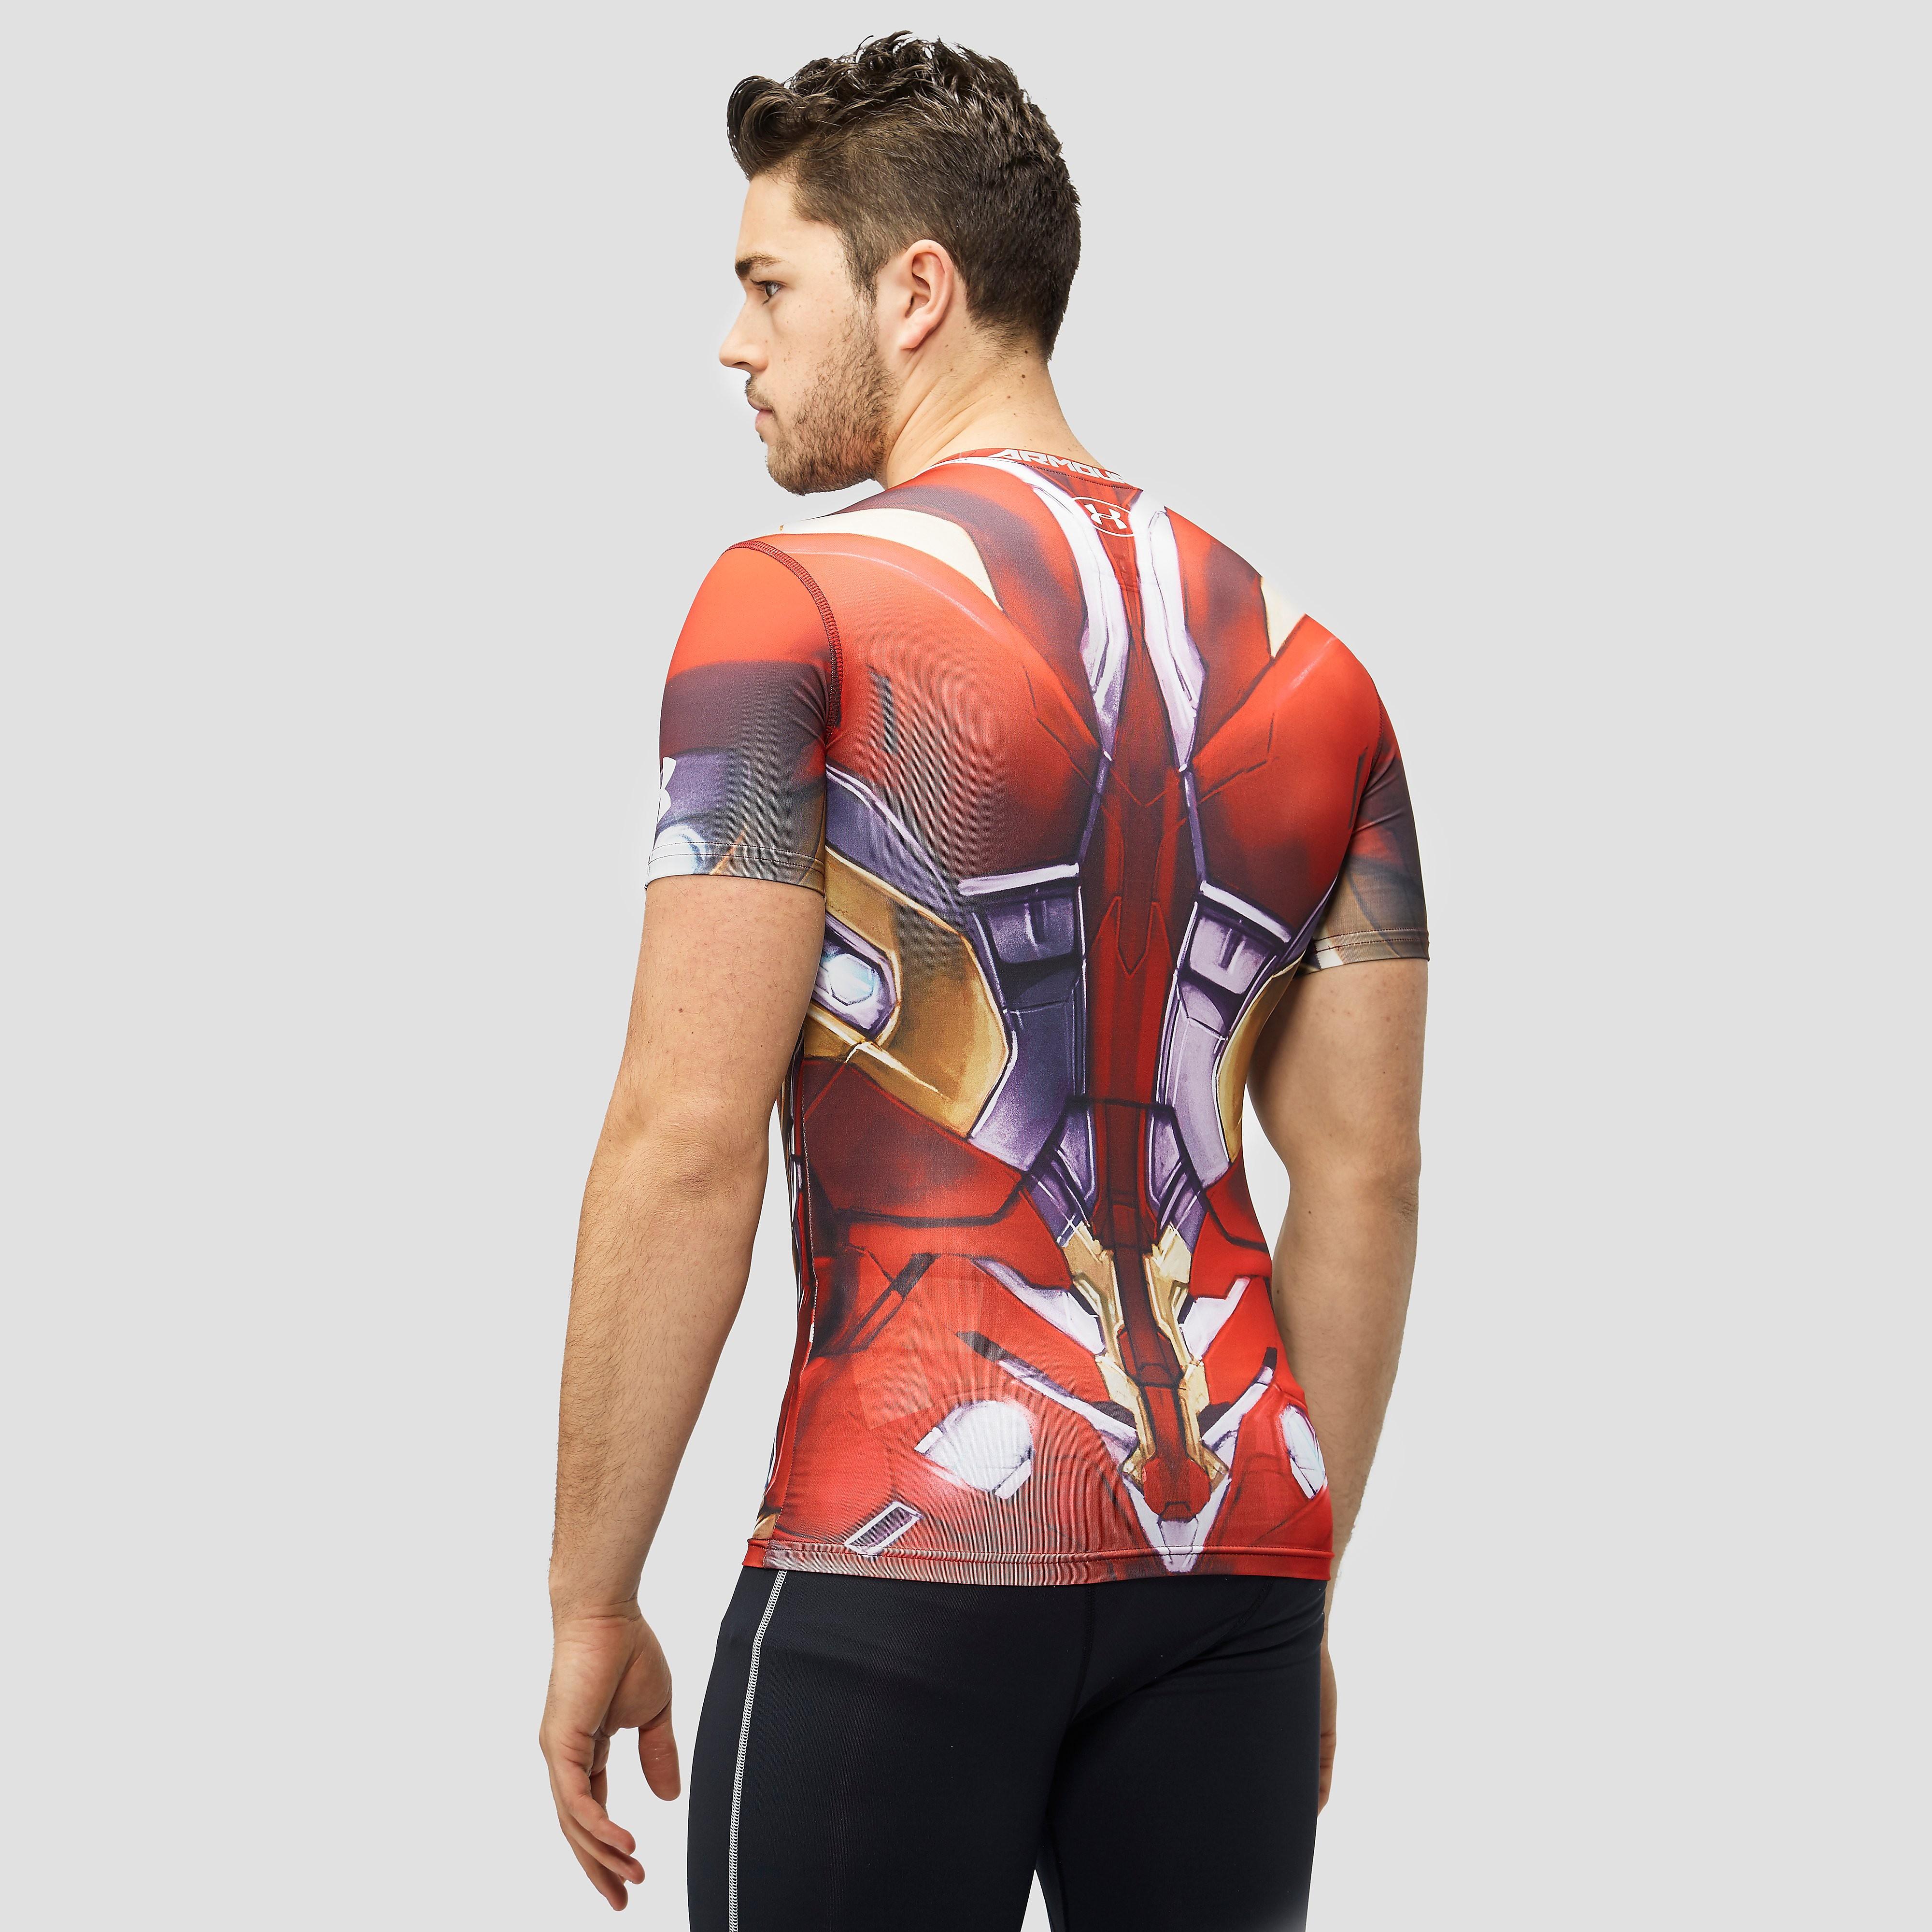 Under armour Alter Ego Iron Man Compression Short Sleeve Men's T-shirt